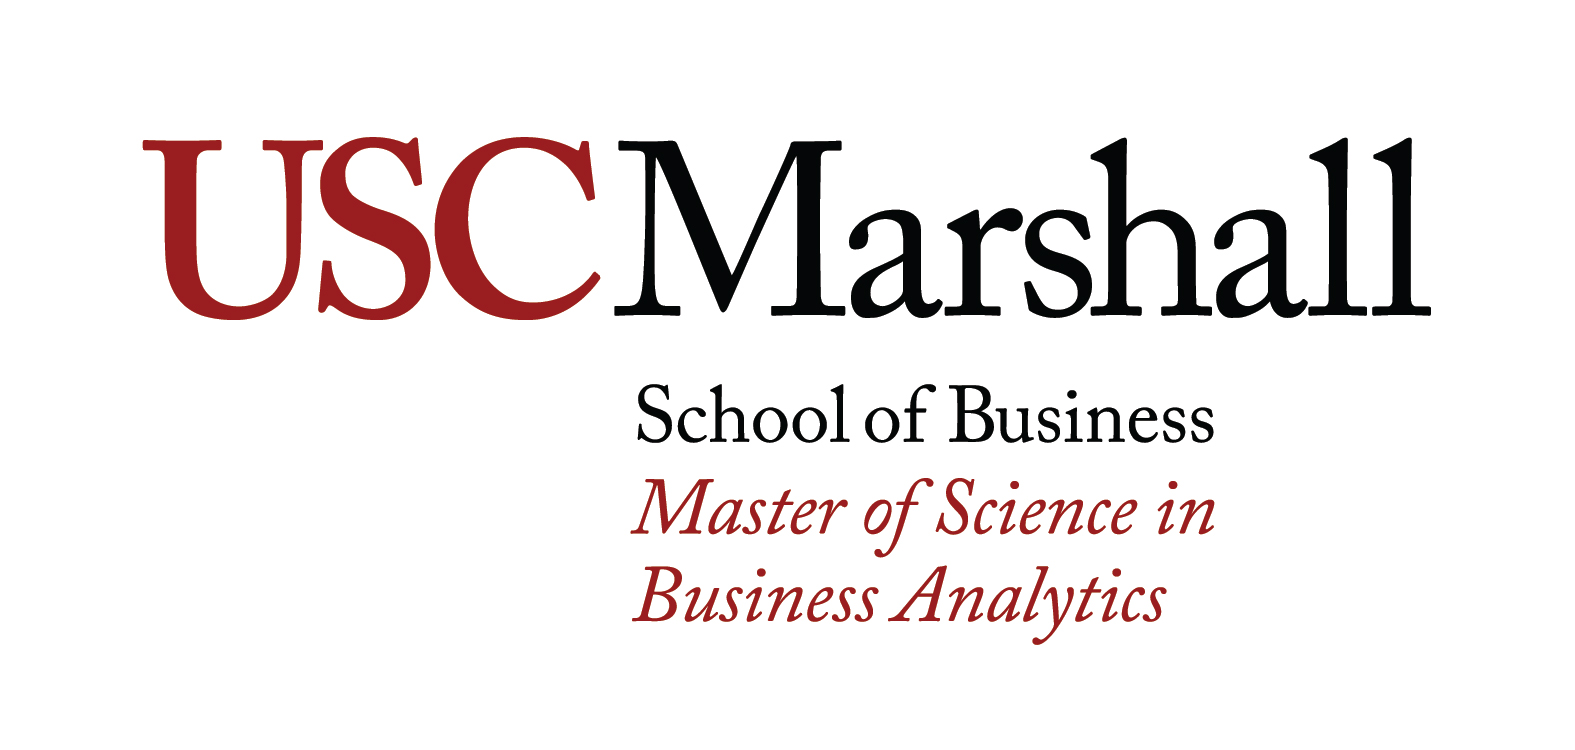 USCMarshall